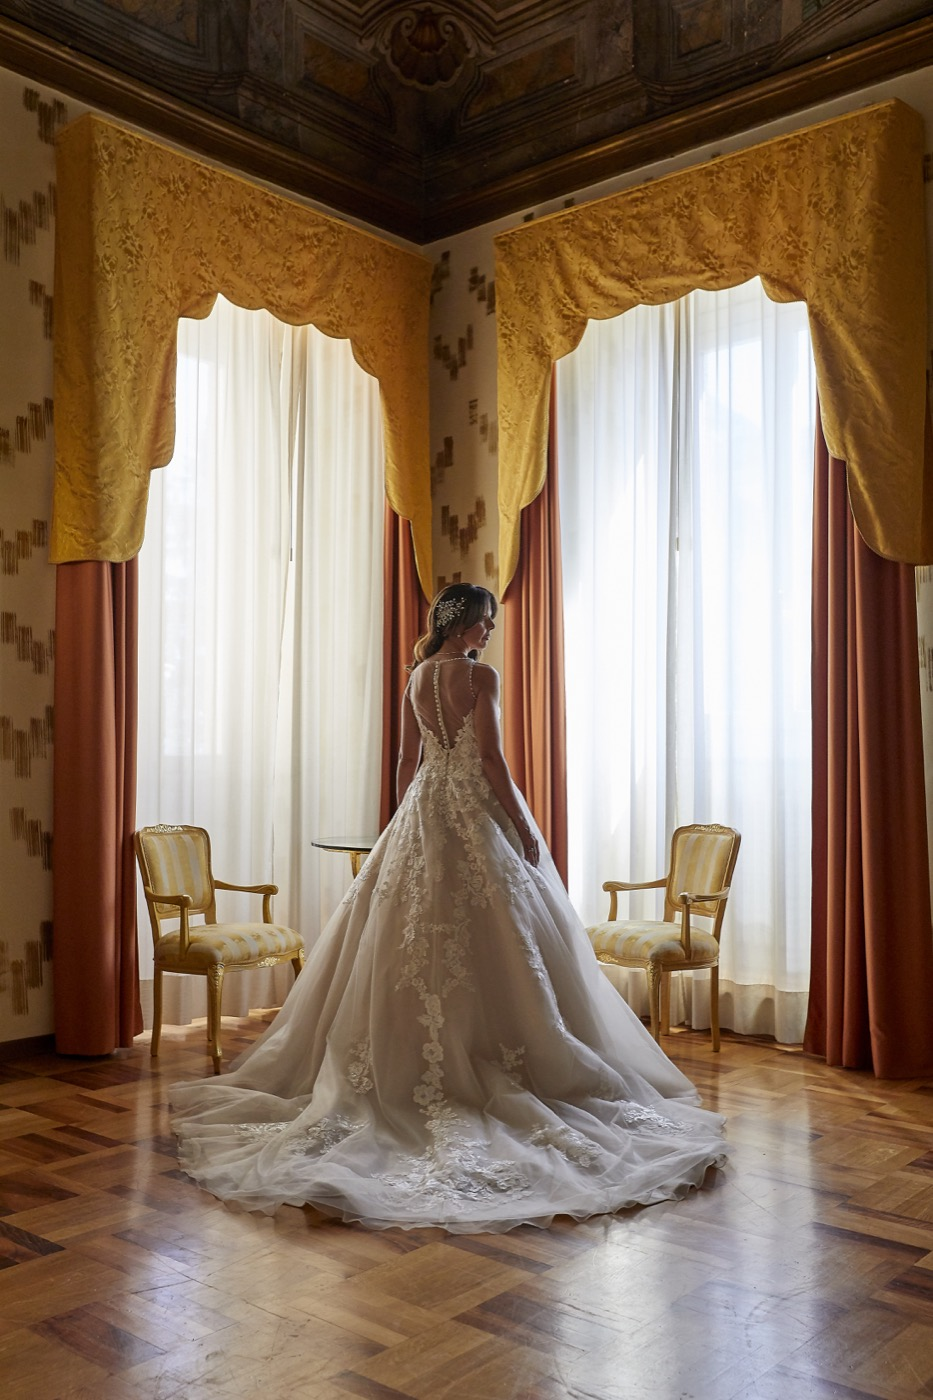 Claudio-Coppola-wedding-photographer-la-scuderia-eventi-preparativi-la-rosetta-perugia-30